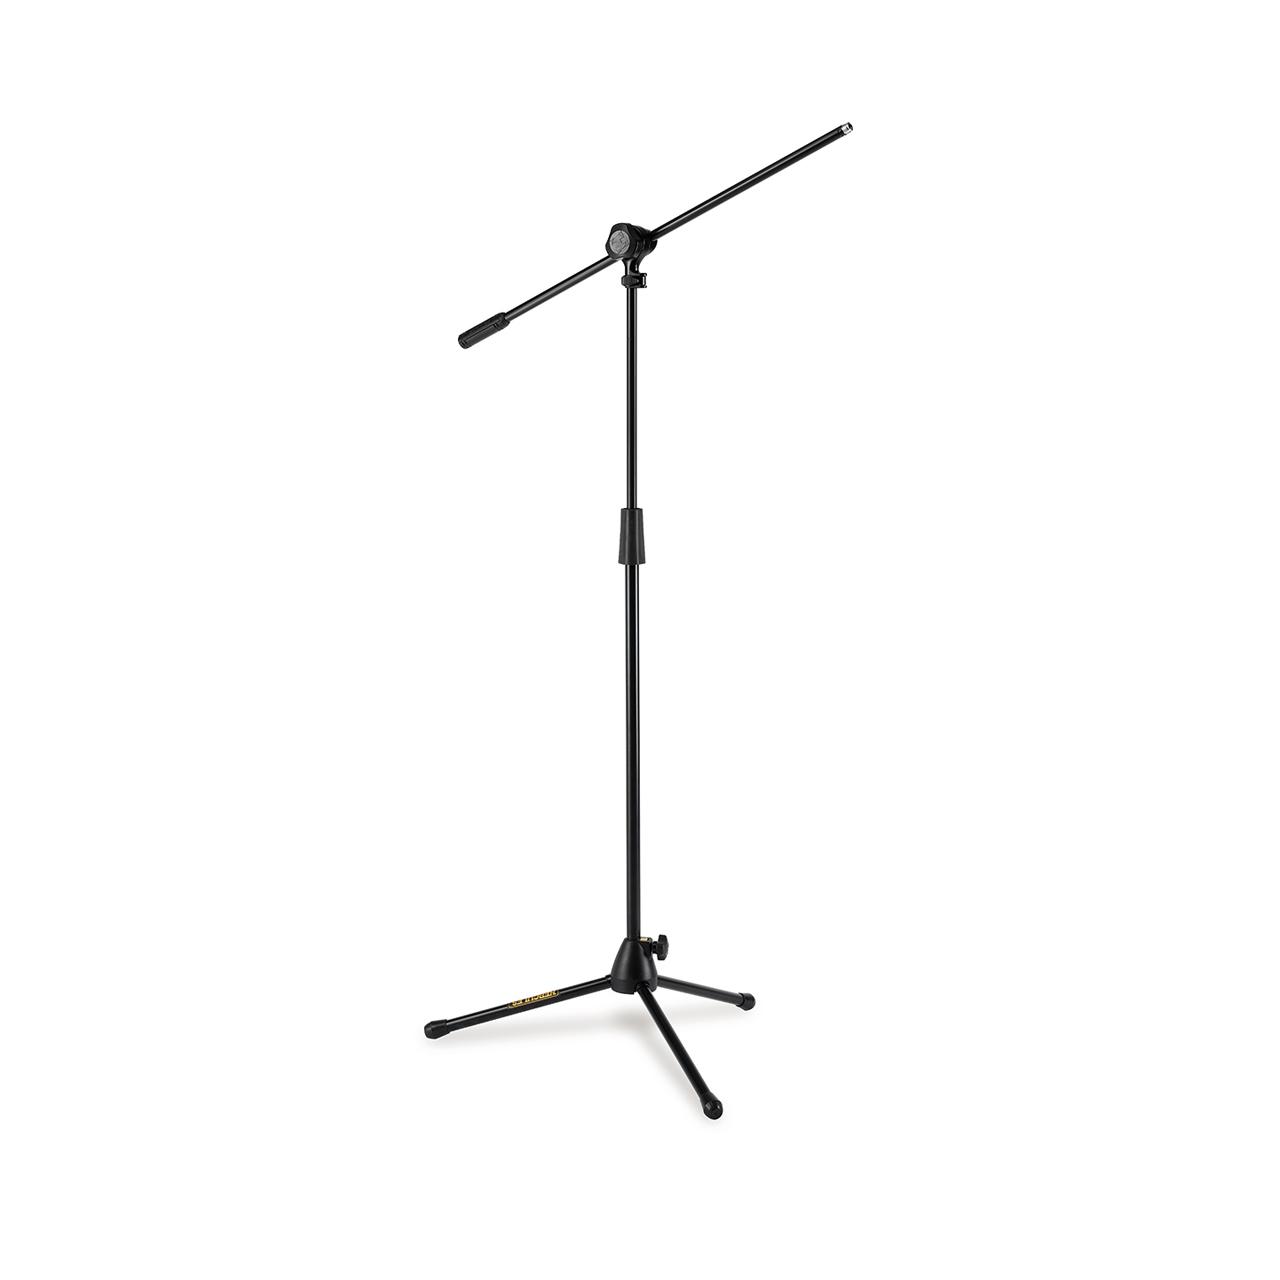 Suporte Girafa P/microfone Quick Turn Ms432b Hercules  - Audio Video & cia